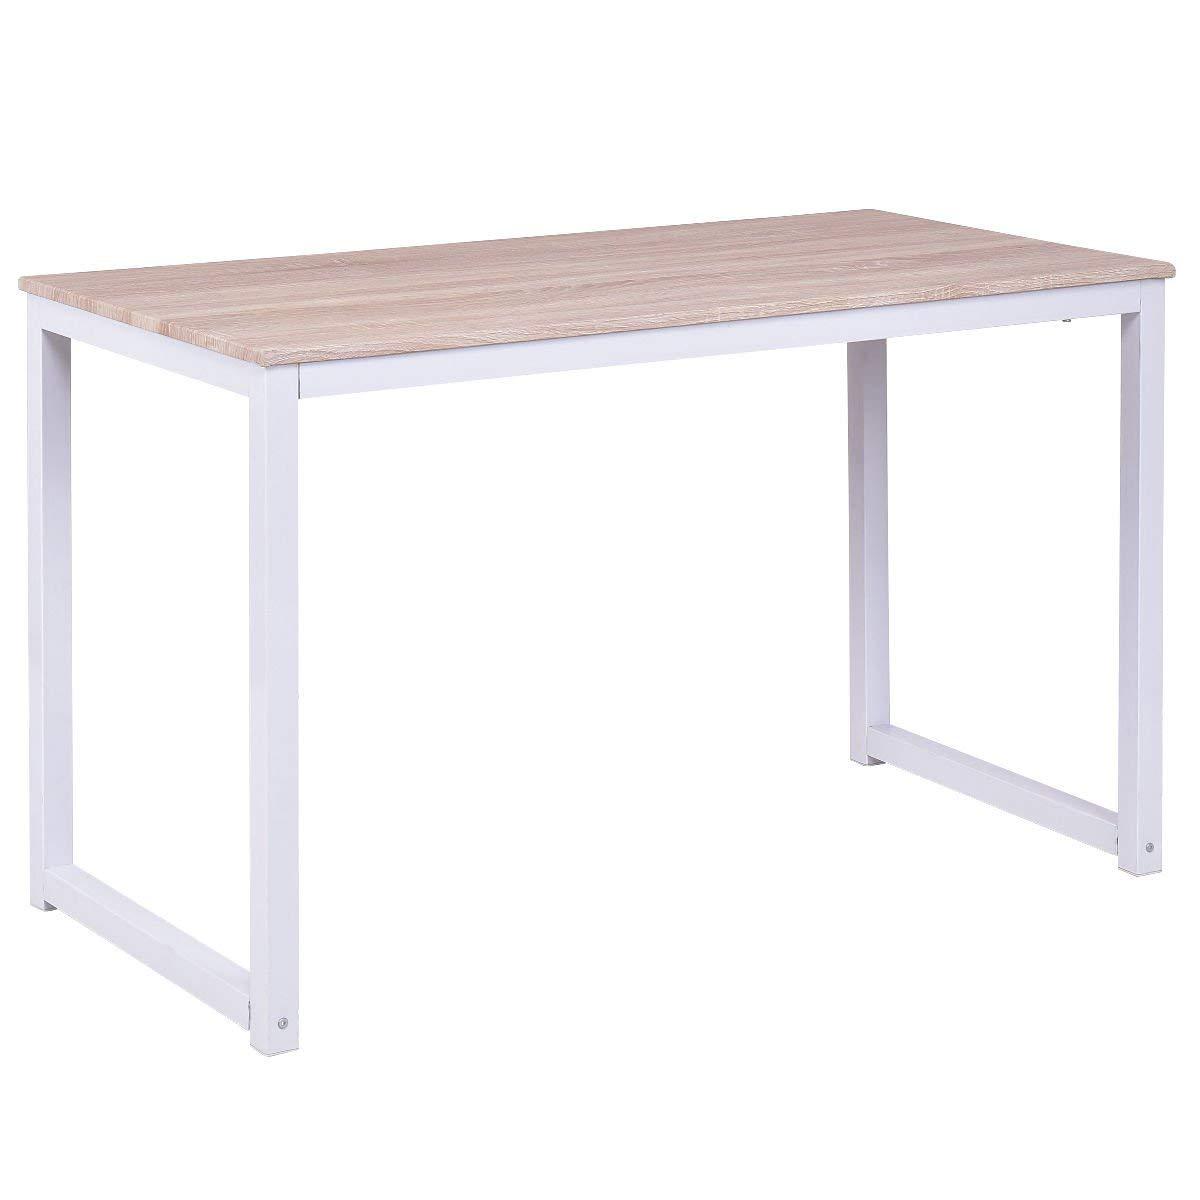 "GHP 47.2""x23.6""29.5"" MDF & Powder Coated Steel Home Office Computer Desk Workstation"